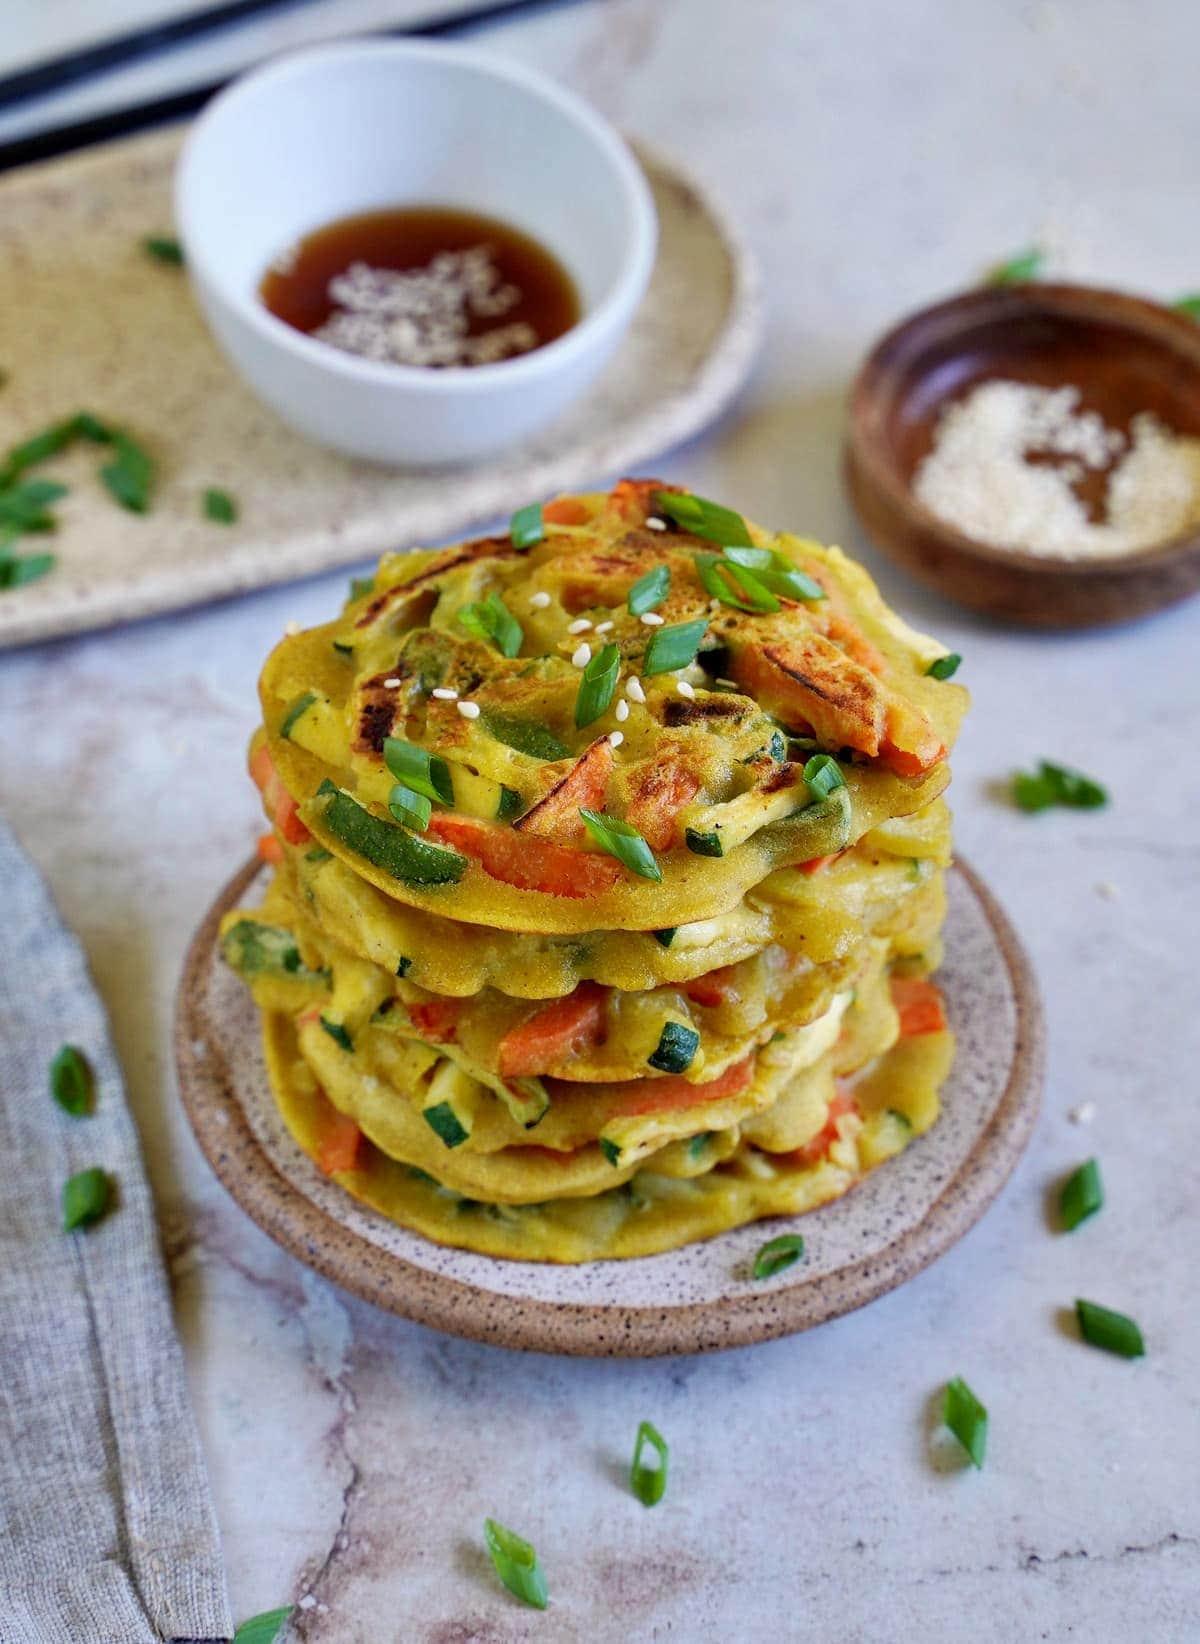 veggie pajeon stack on plate